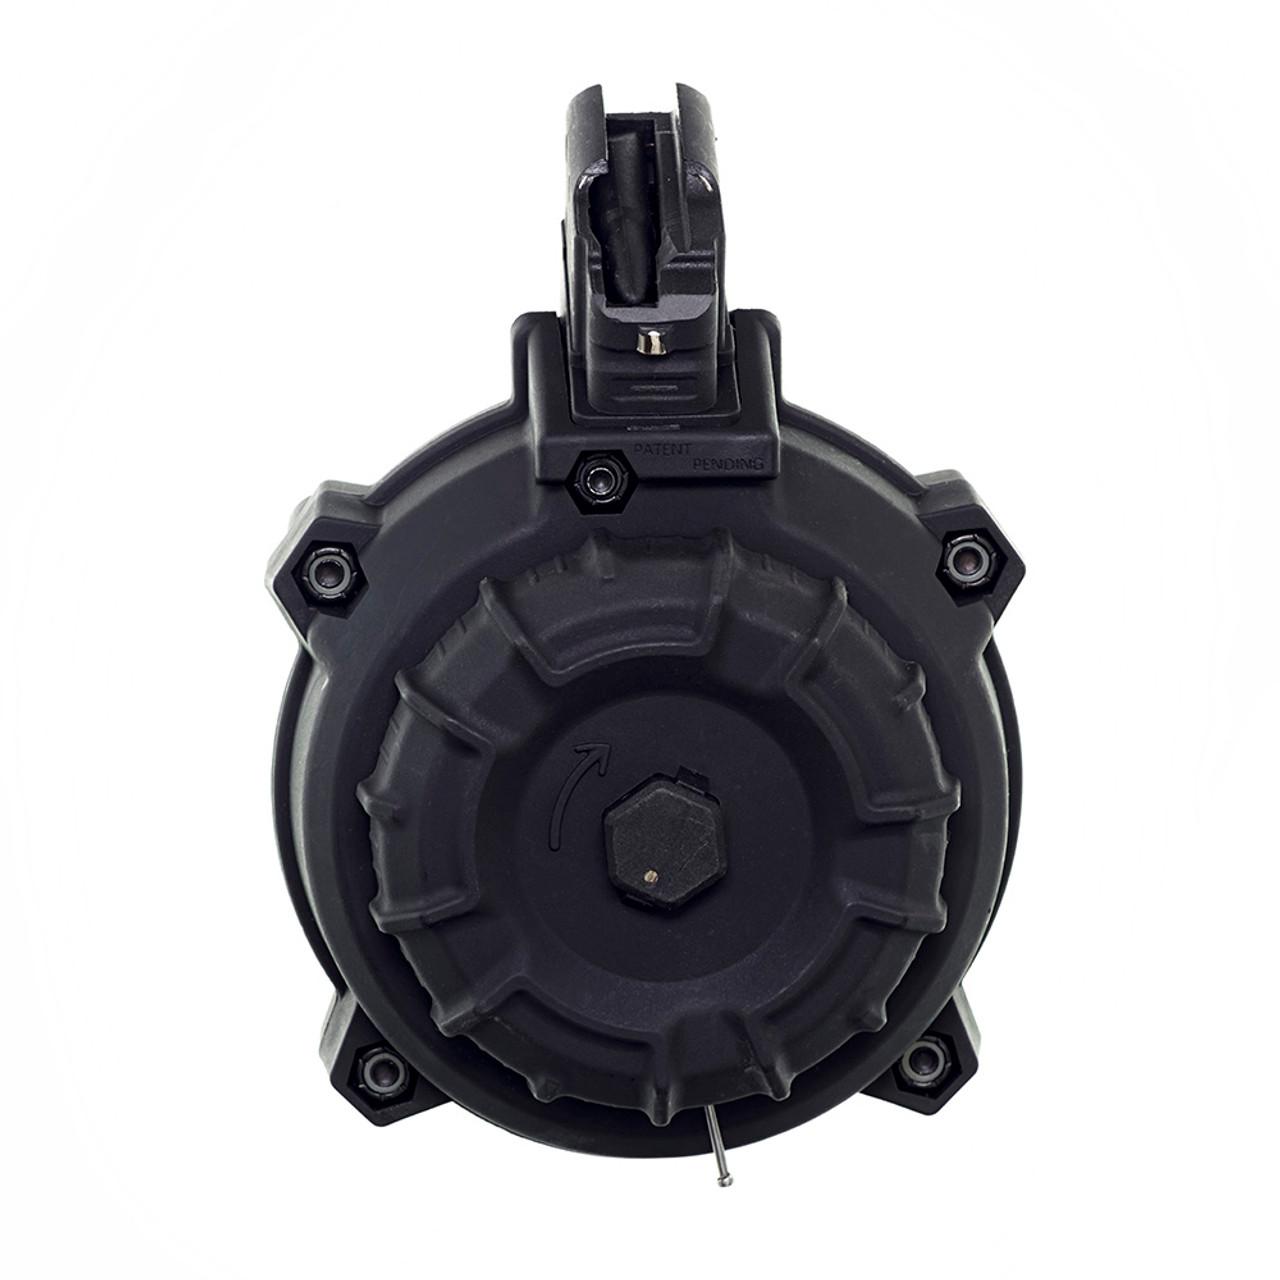 AK-47® 7.62x39mm (50) Rd - Black Polymer Drum